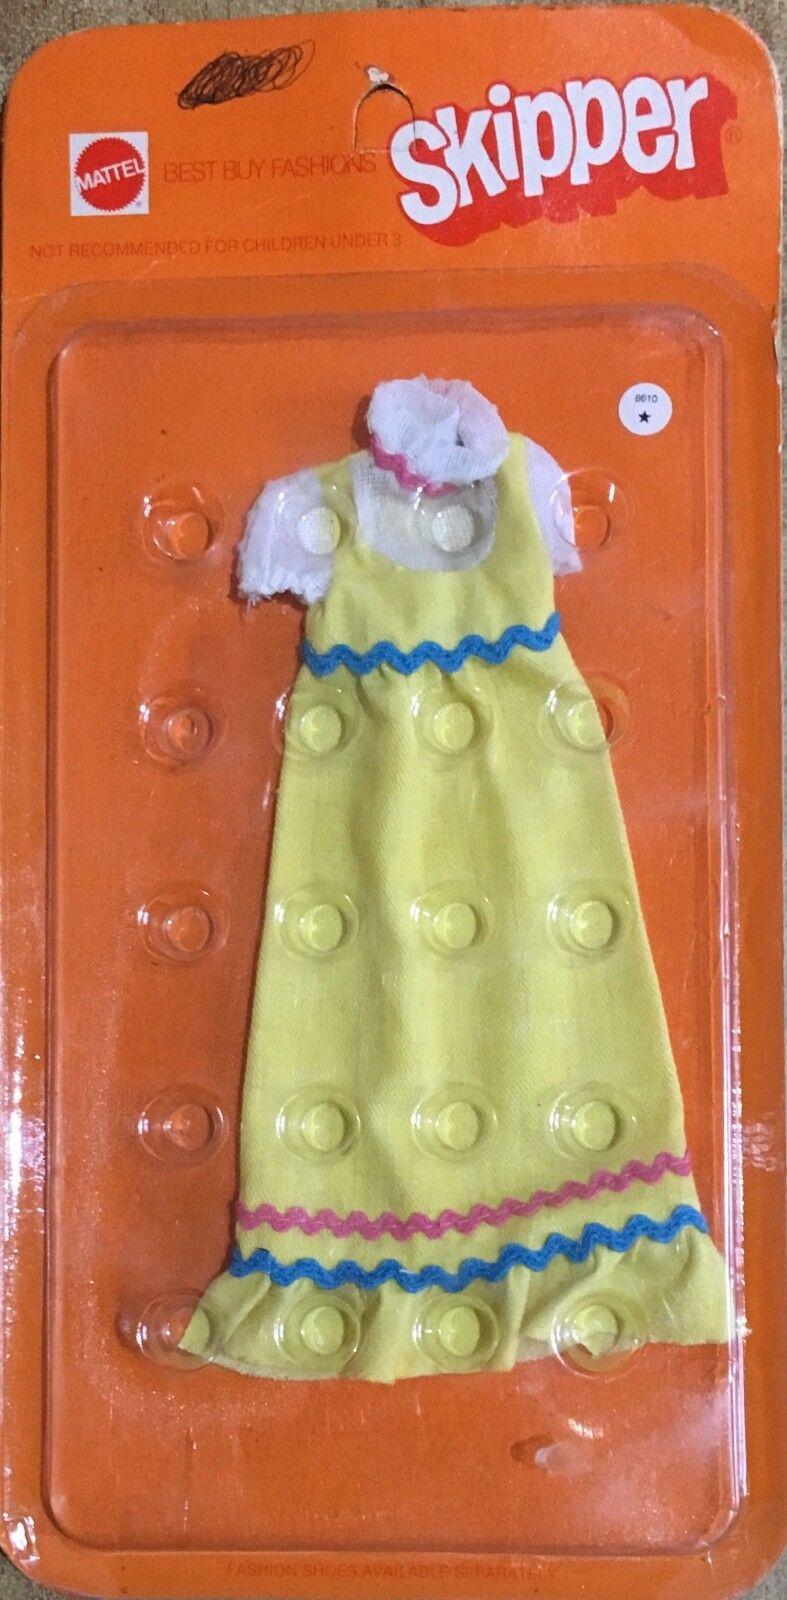 Barbie Barbie Barbie Skipper Mattel Outfit Vestito Vintage 1972' RARO 450ee0